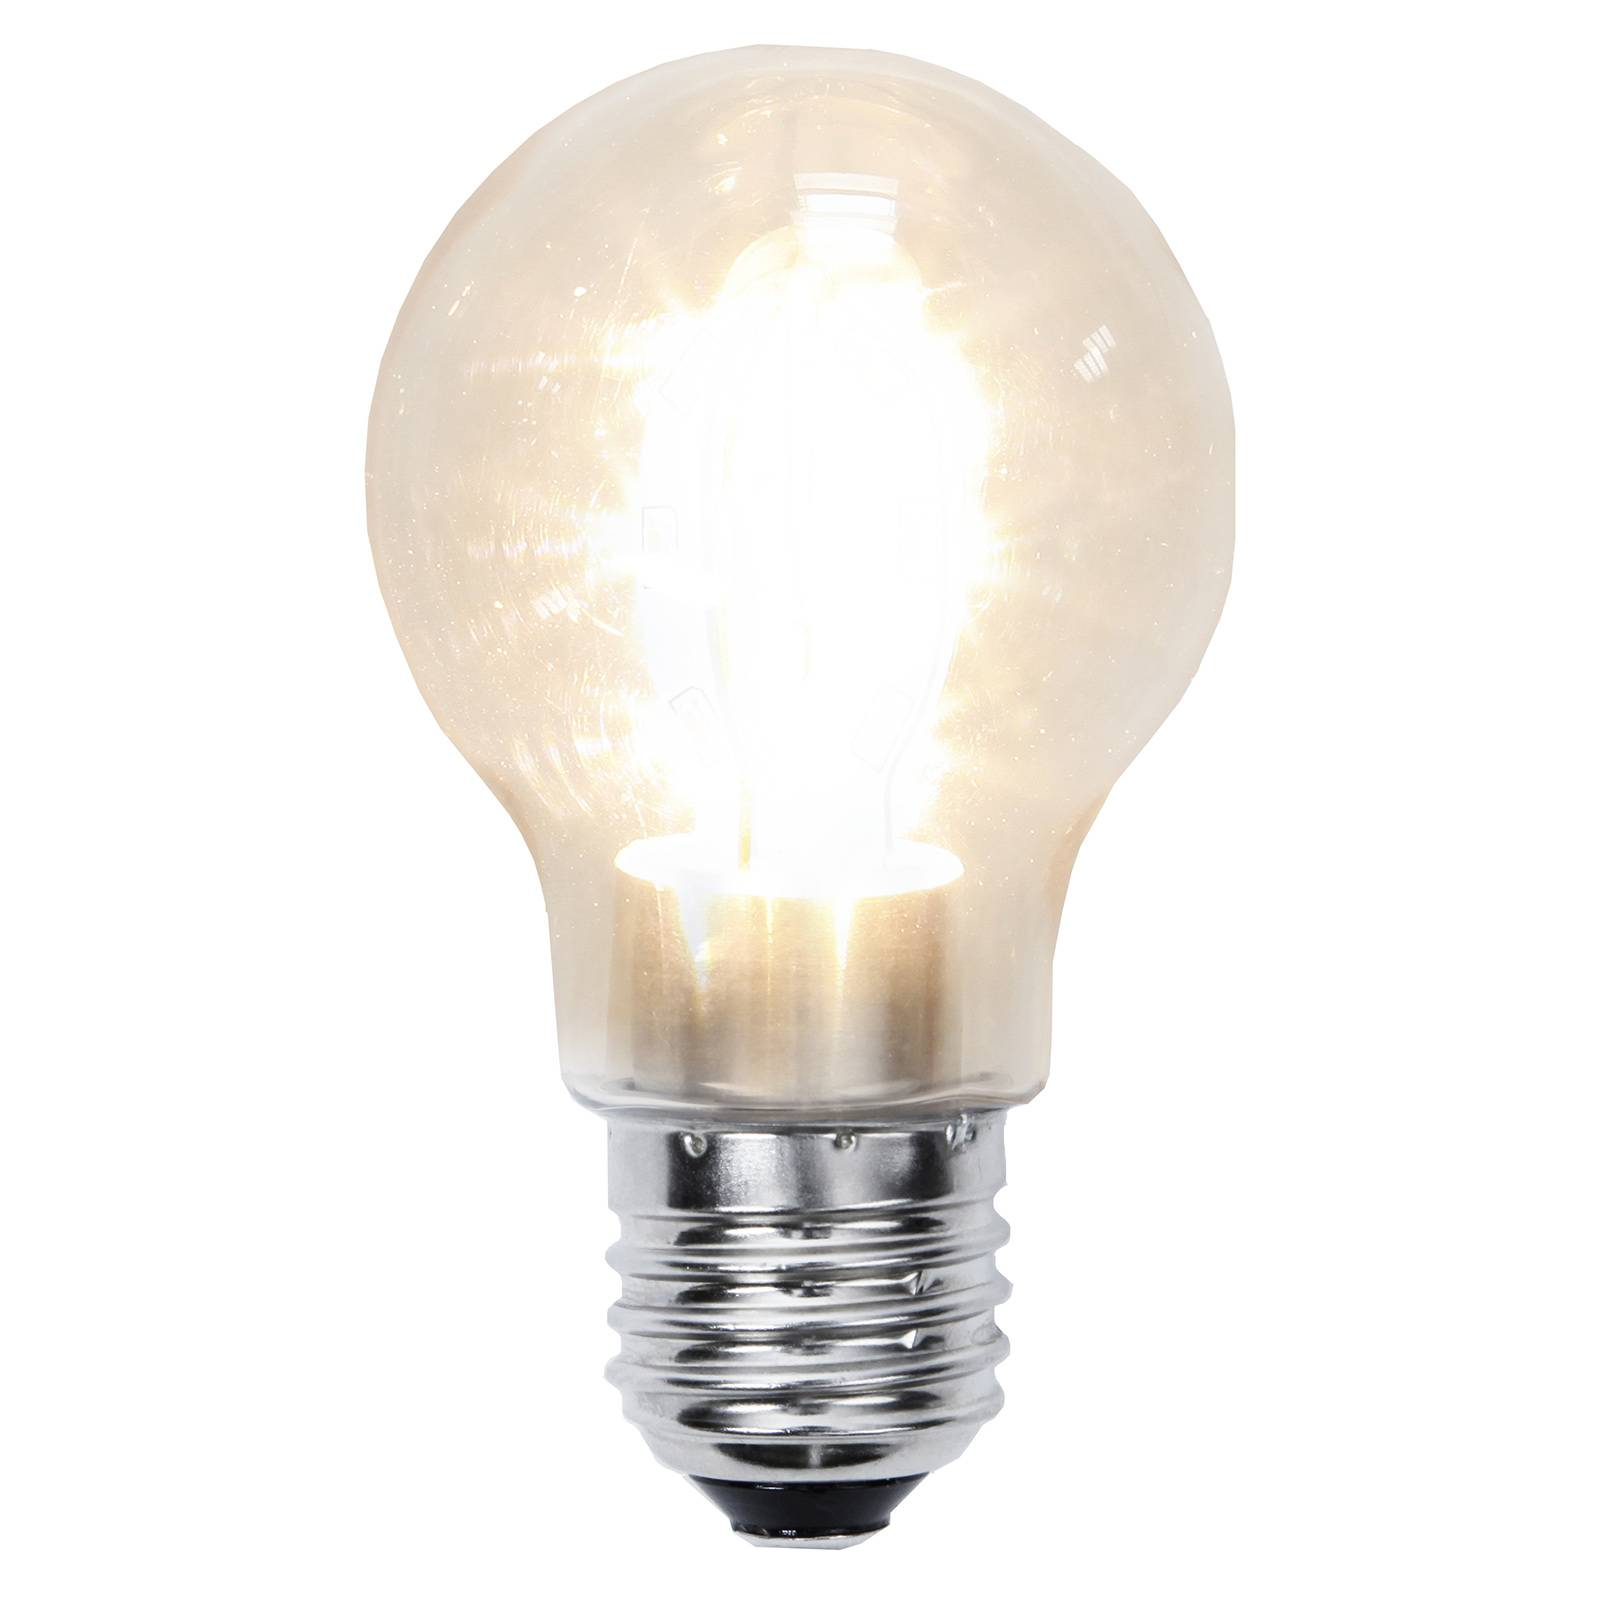 Lampadina LED E27 A55 1,6W 2.100K trasp. antiurto